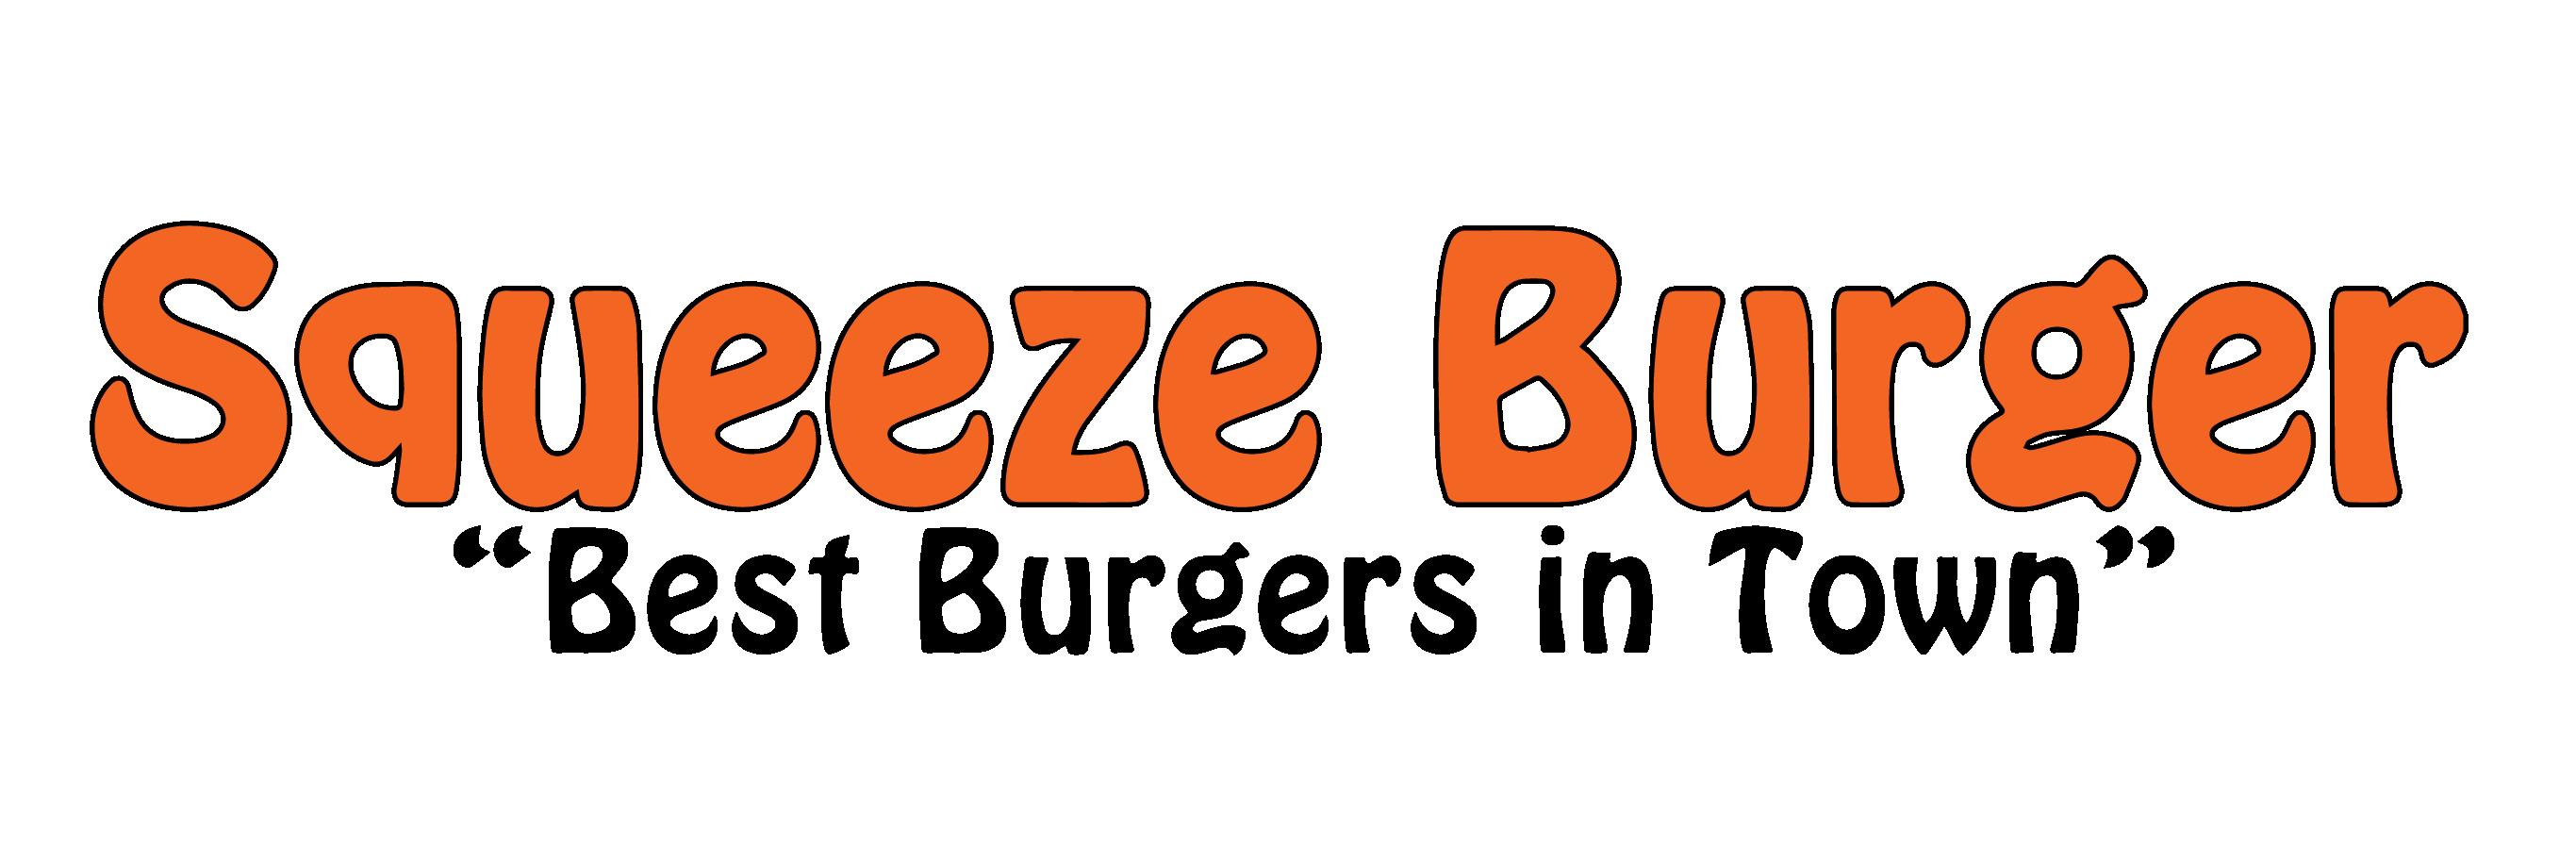 Squeeze Burgers